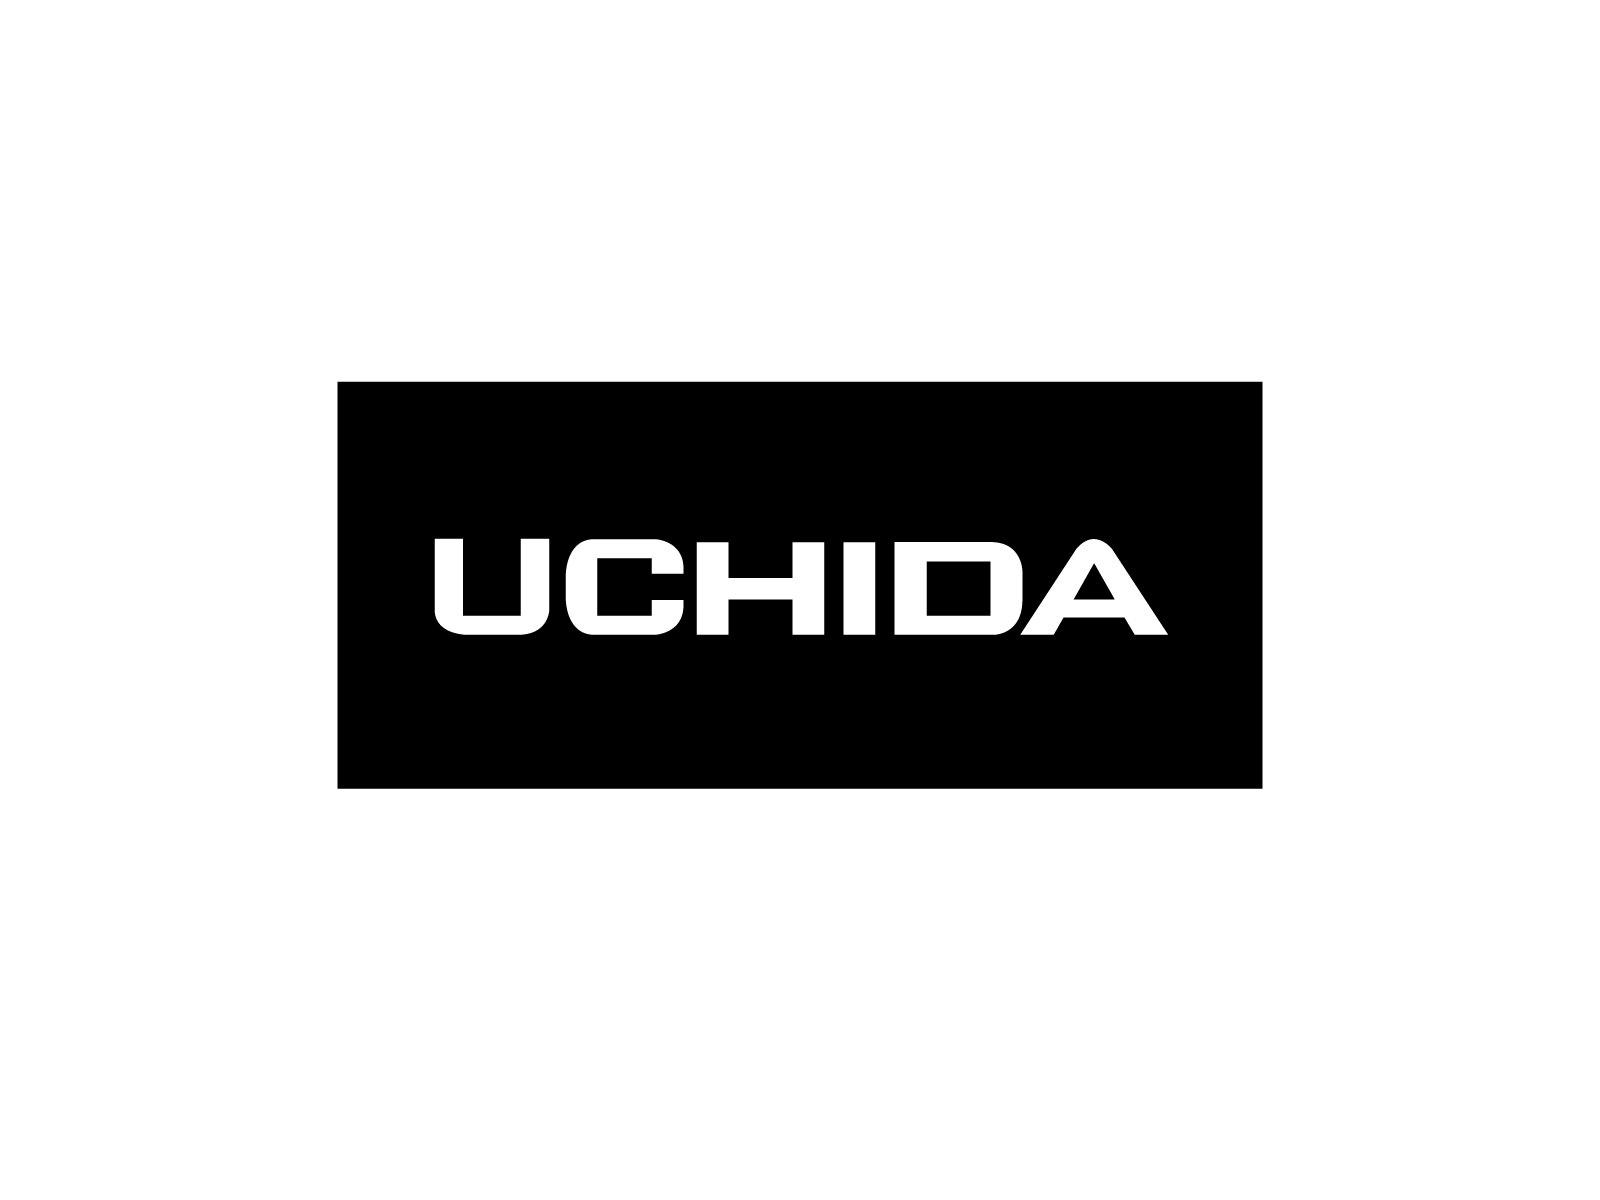 works_uchida_logo_01